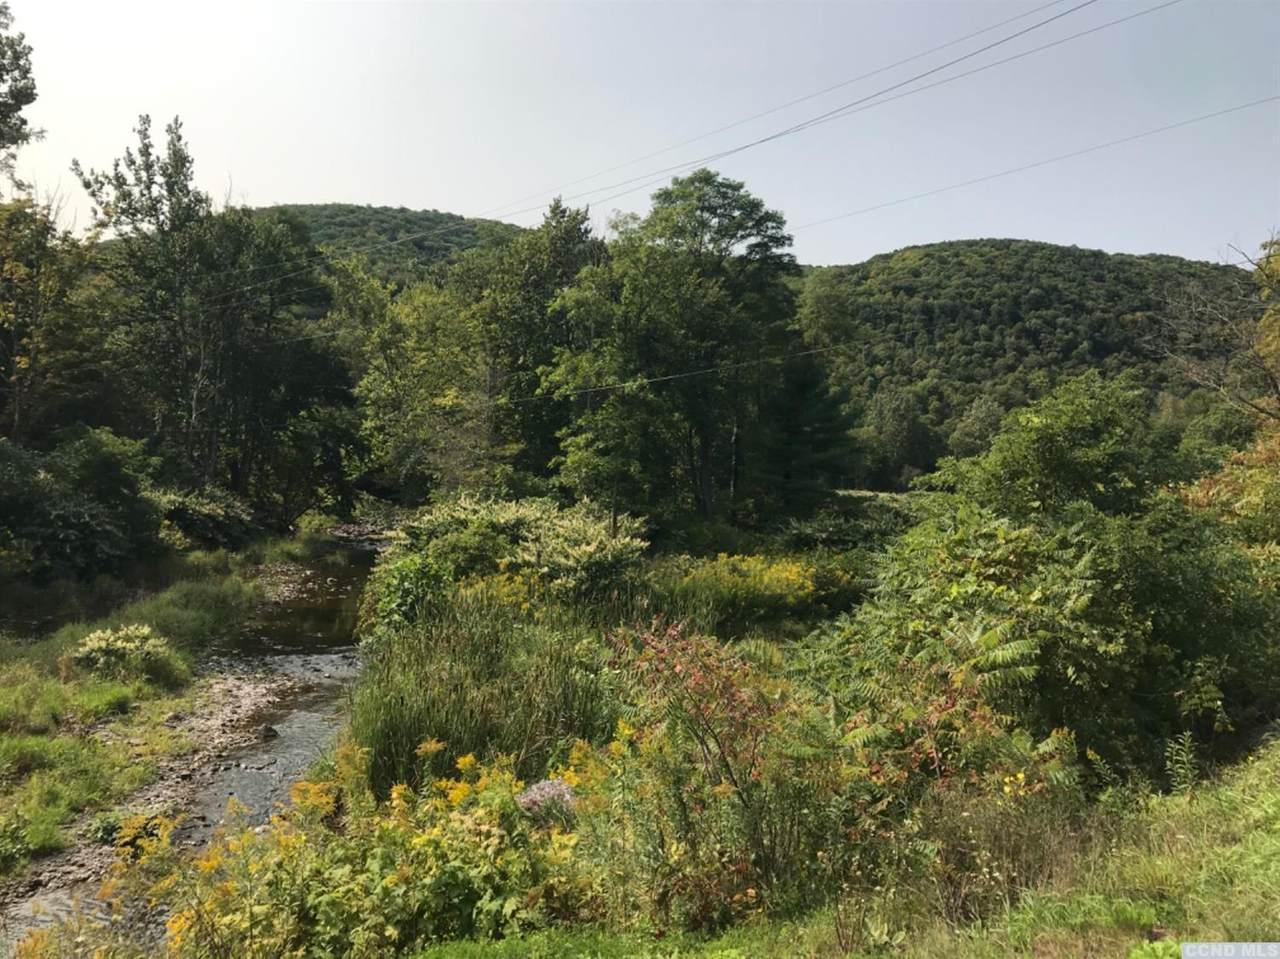 0 Cc Camp Road - Photo 1